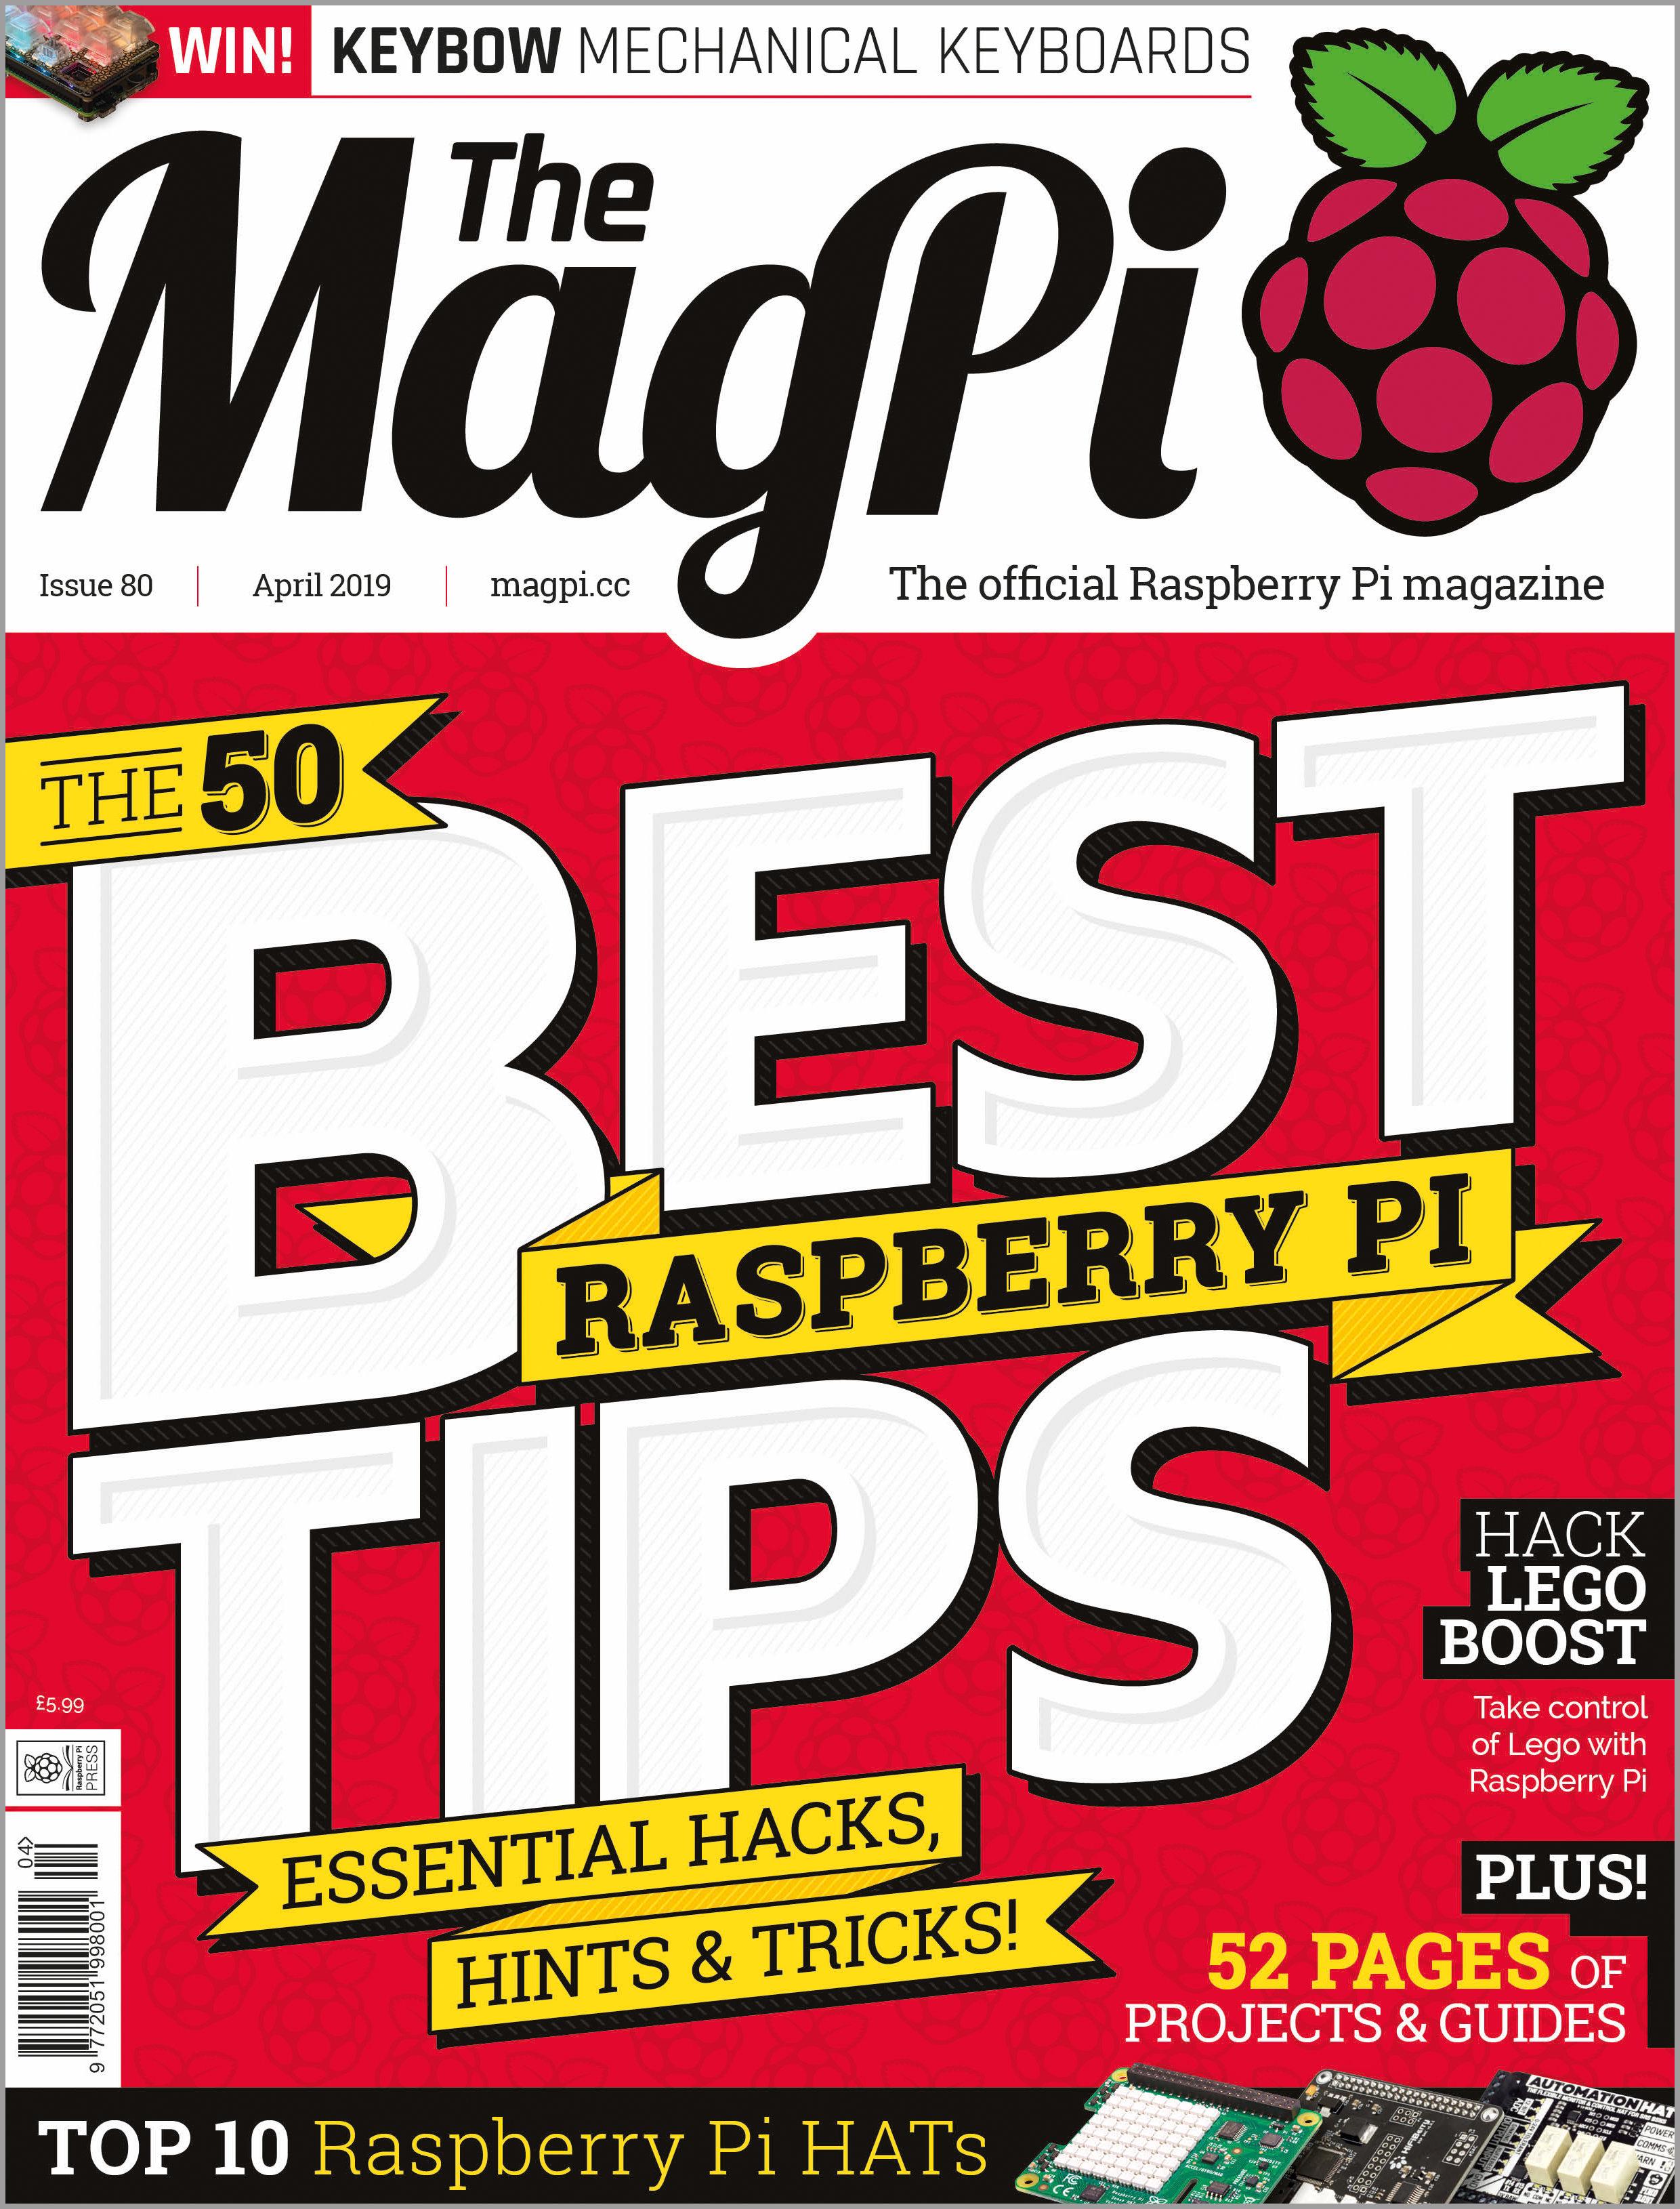 001 magpi80 cover web